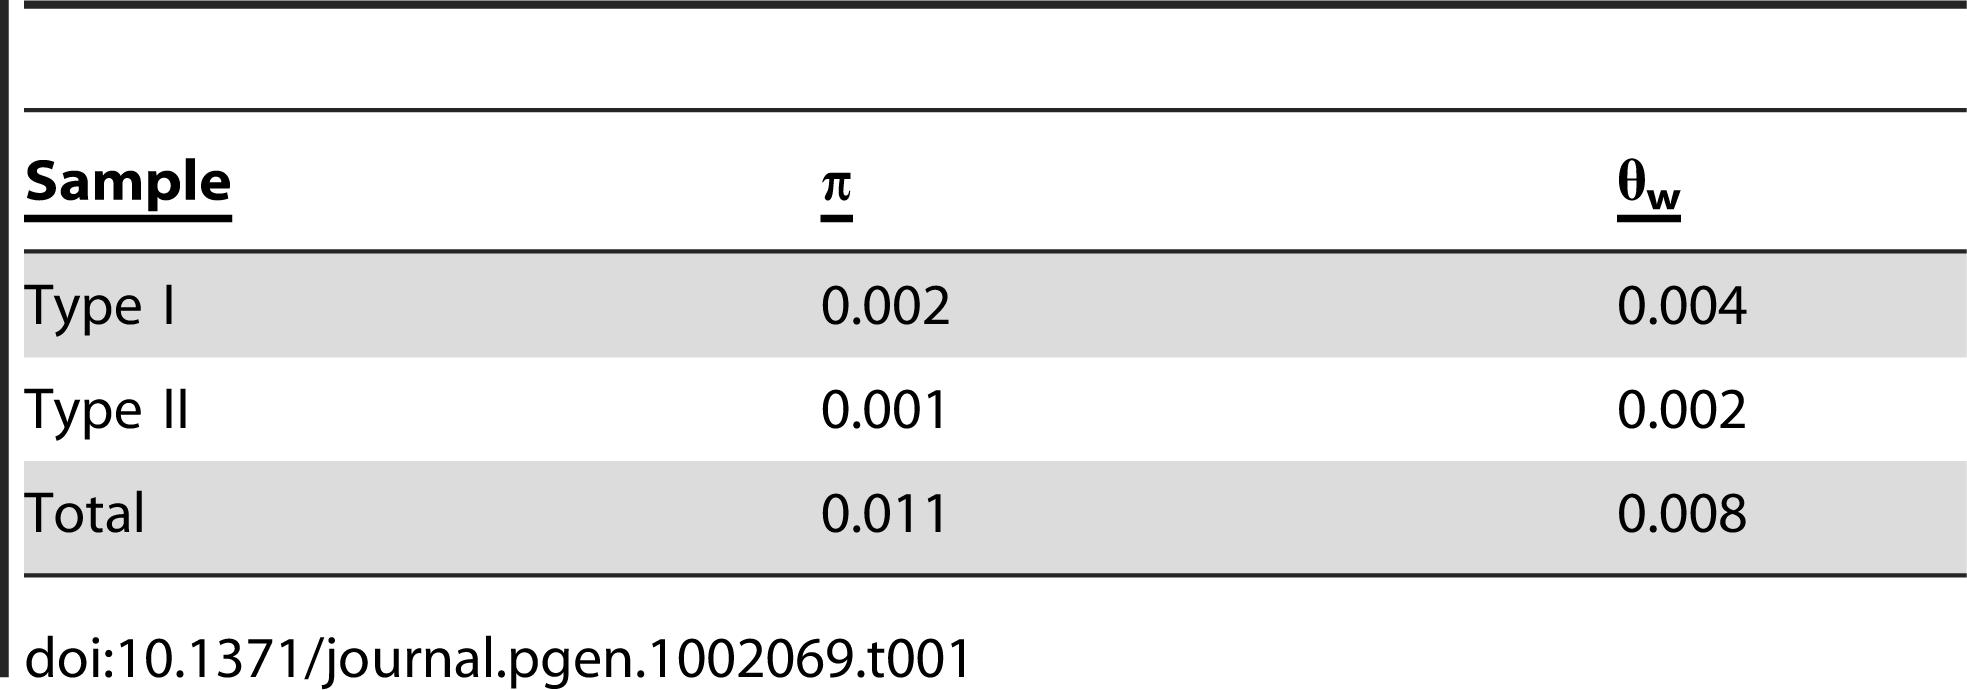 Summary of diversity indices for <i>ATMYC1.</i>